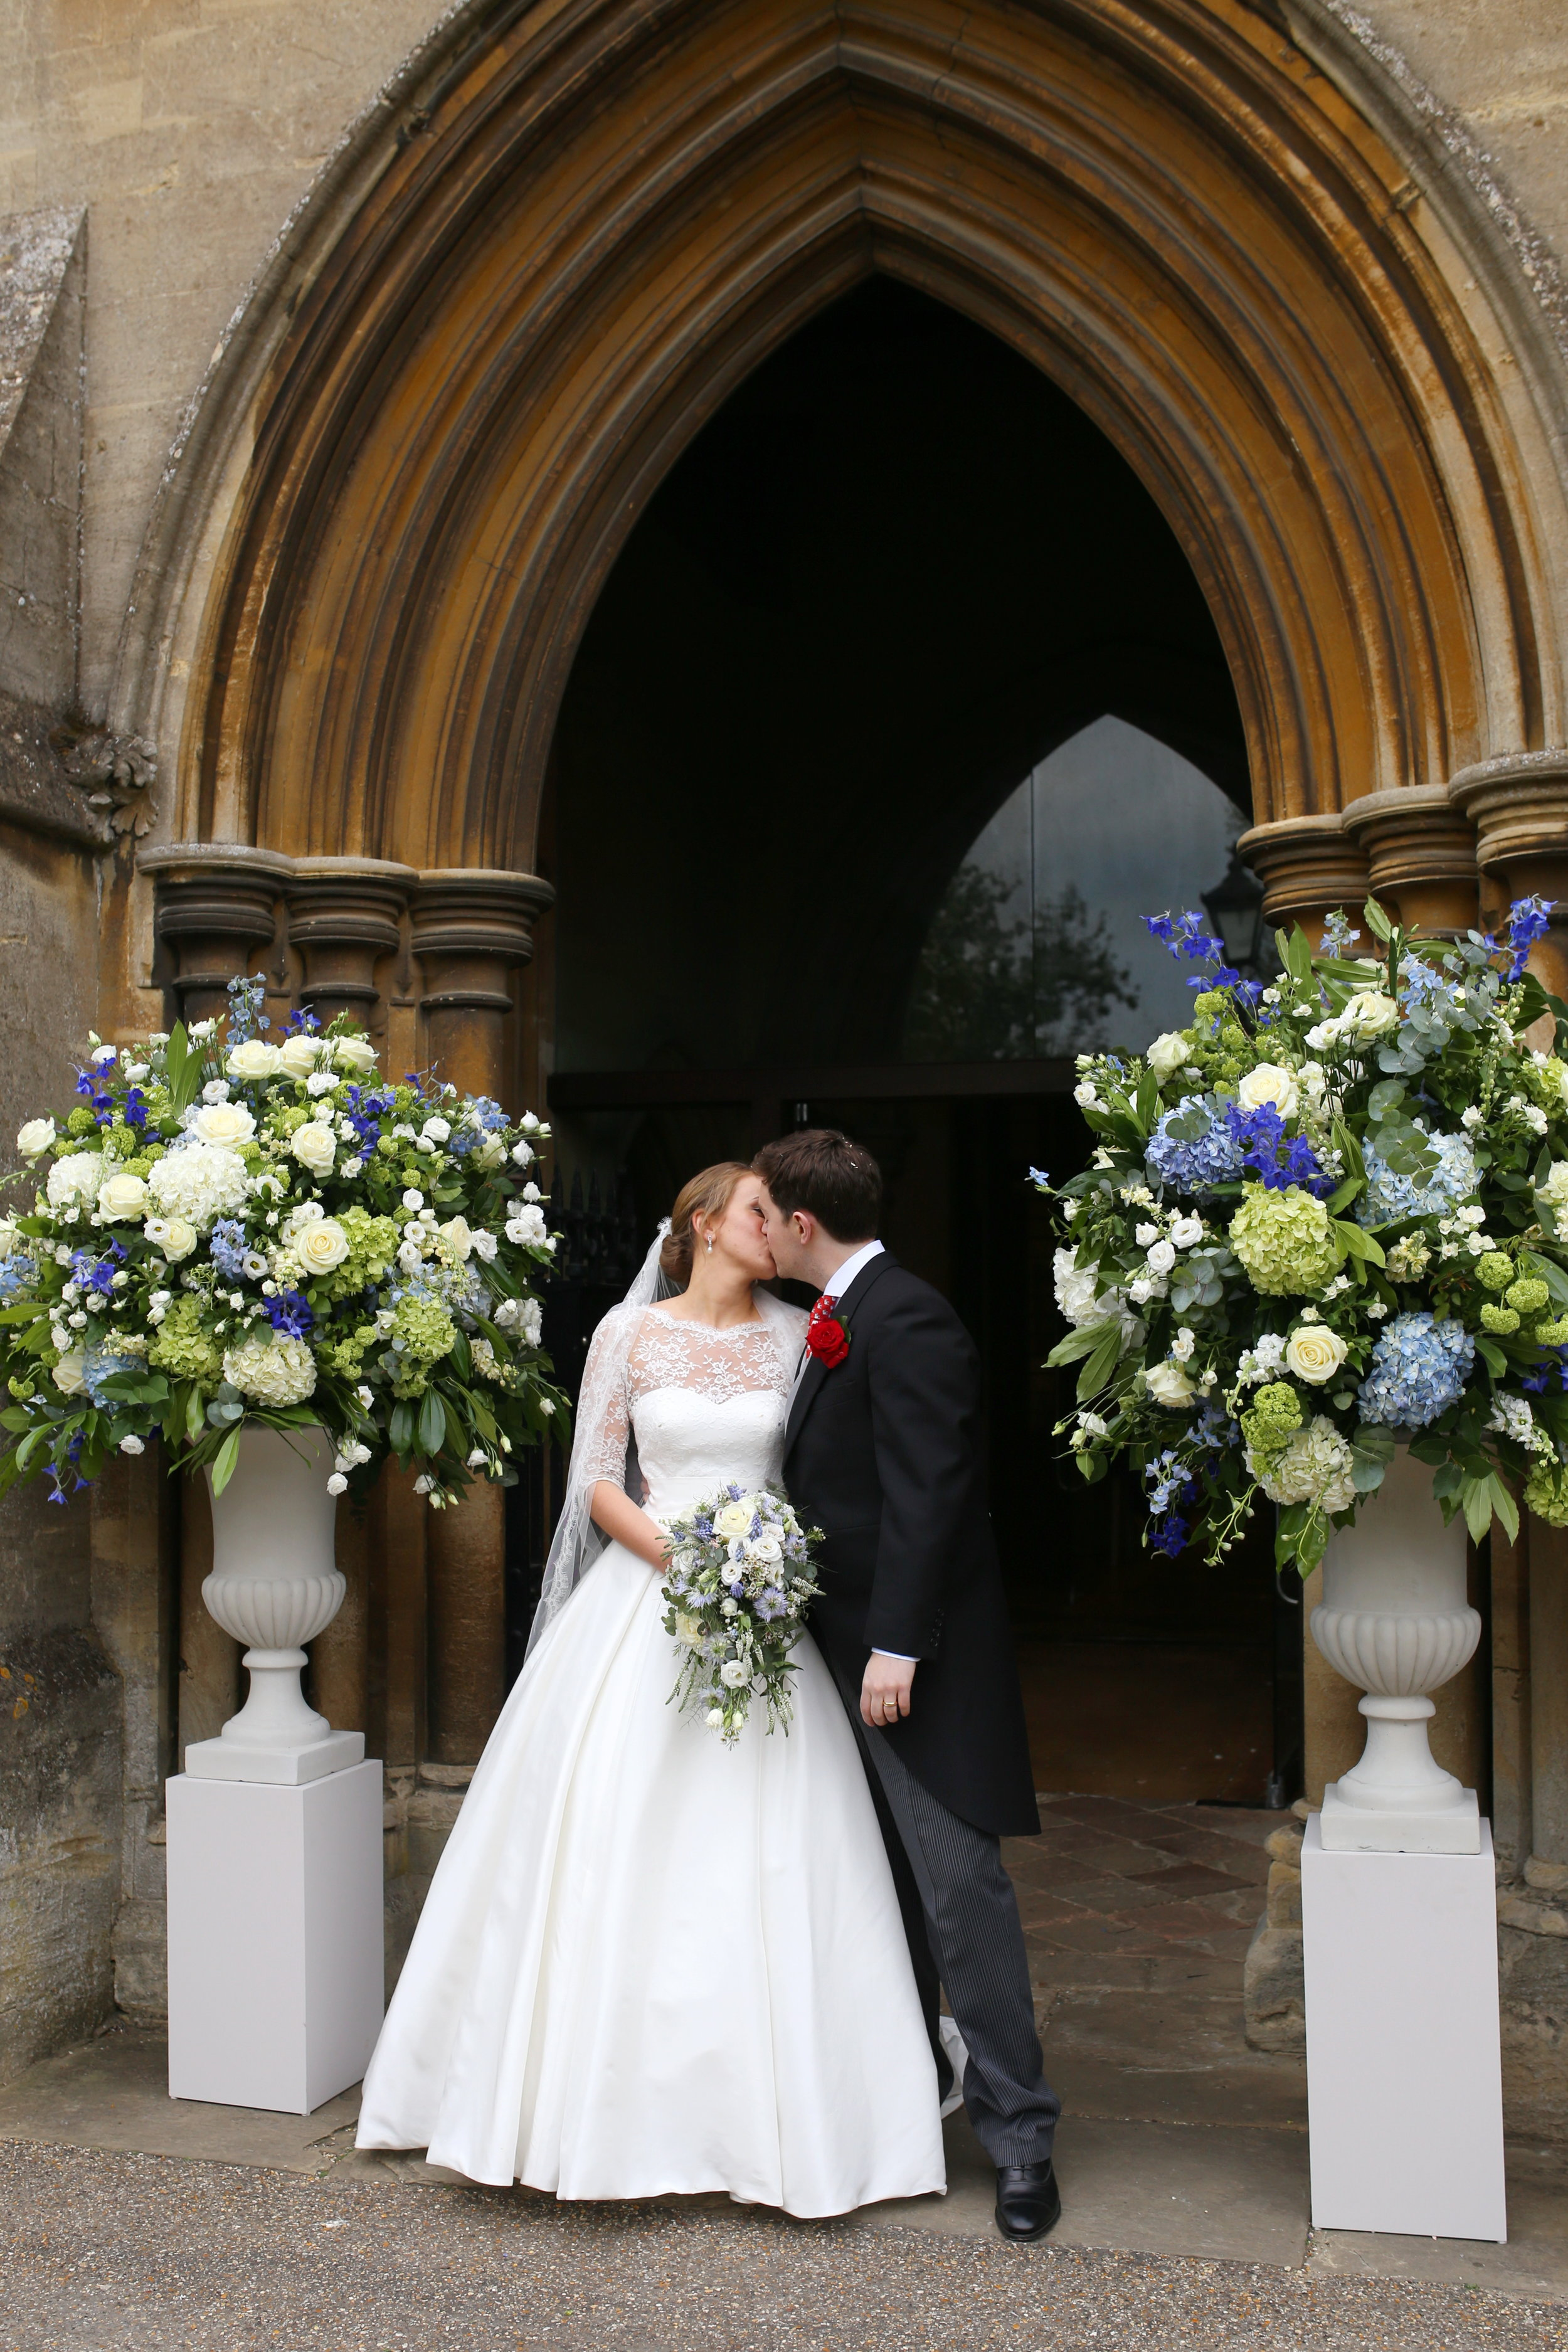 MIRIAM_FAITH_WEDDING_FLOWERS_CEREMONY_URN_CHURCH_PEDESTAL_BLUE_WHITE_GREEN_CASCADE.JPG